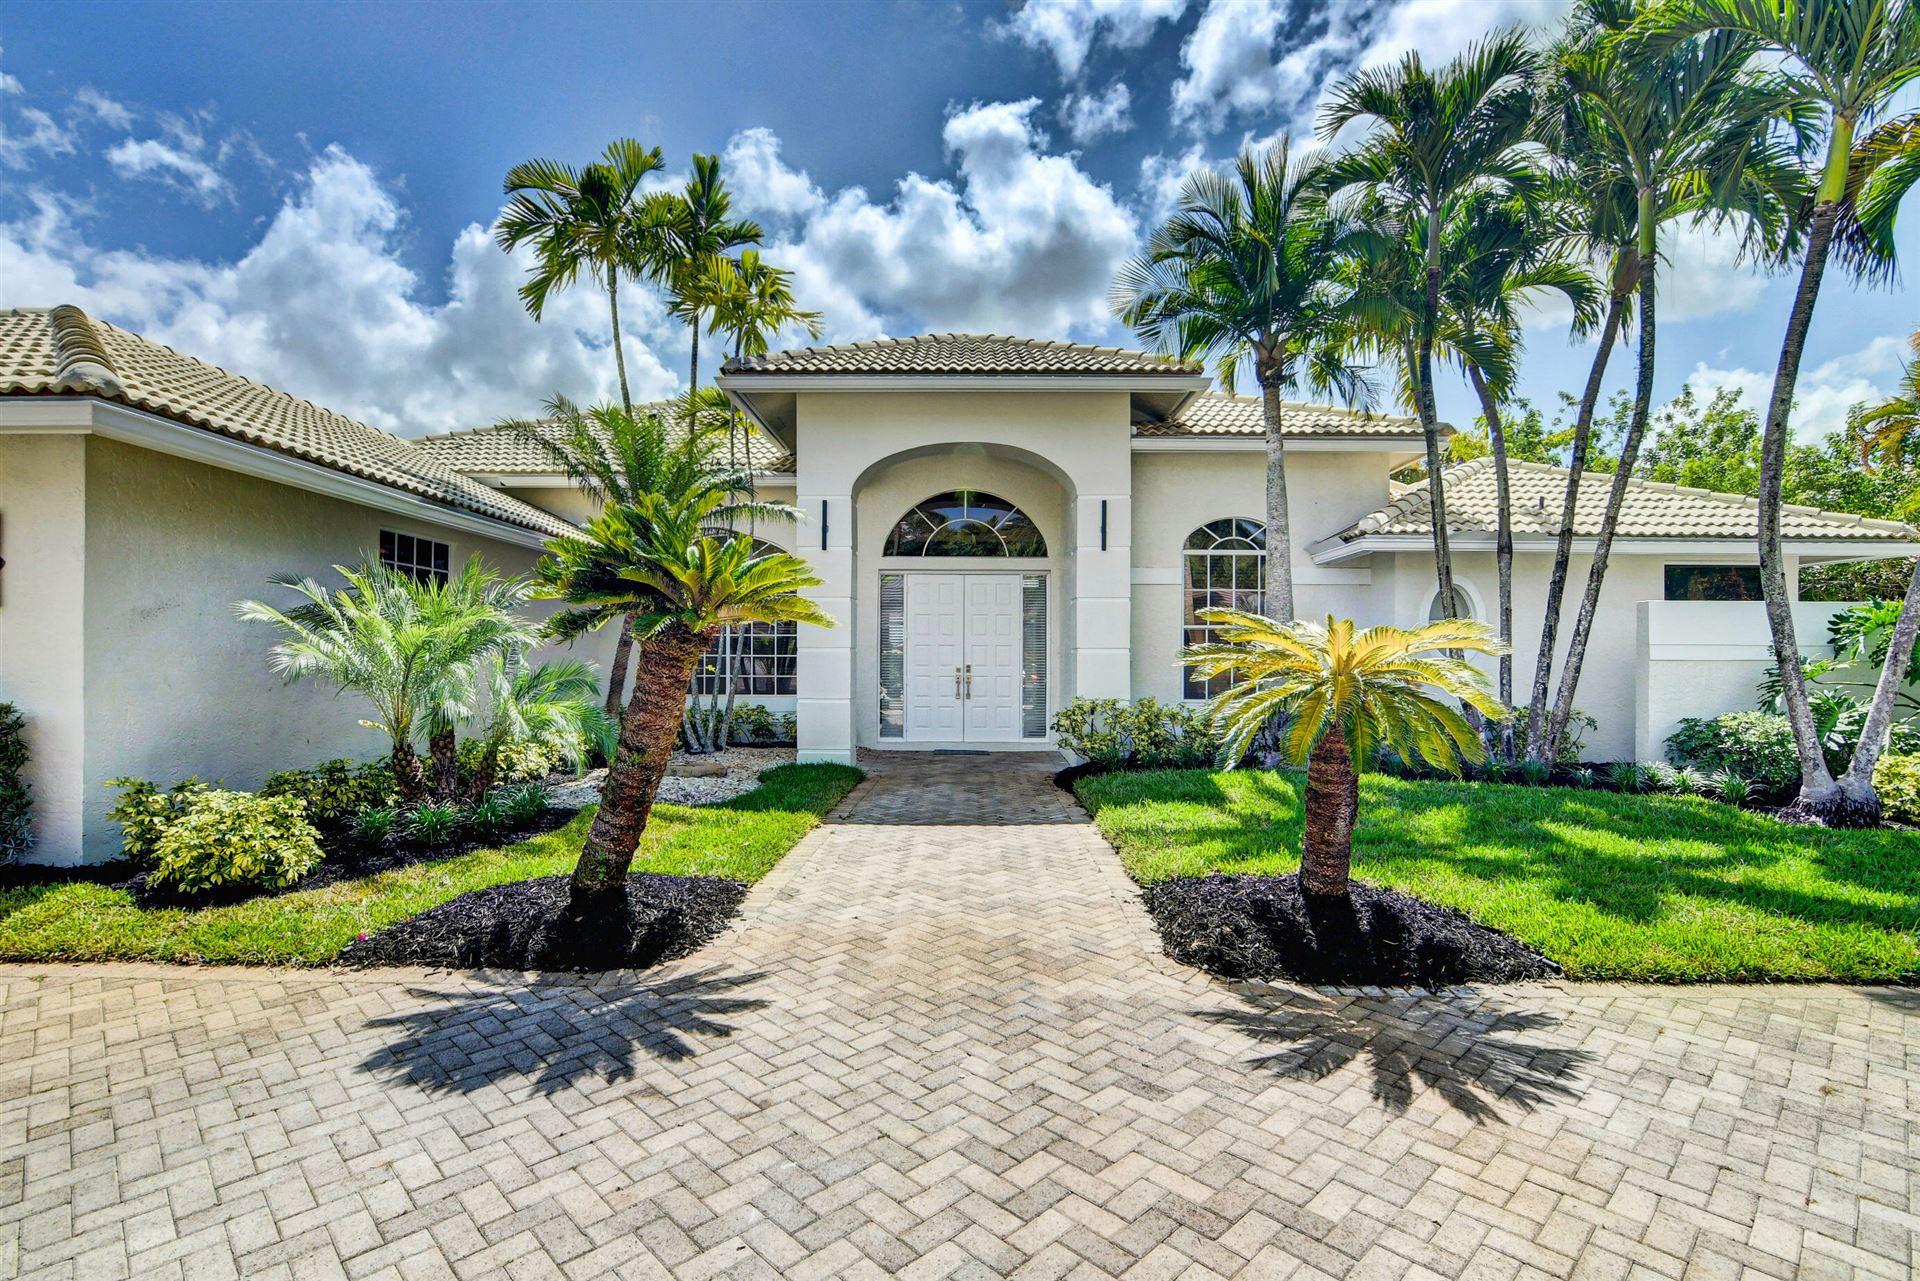 10595 Stonebridge Boulevard, Boca Raton, FL 33498 - MLS#: RX-10721692